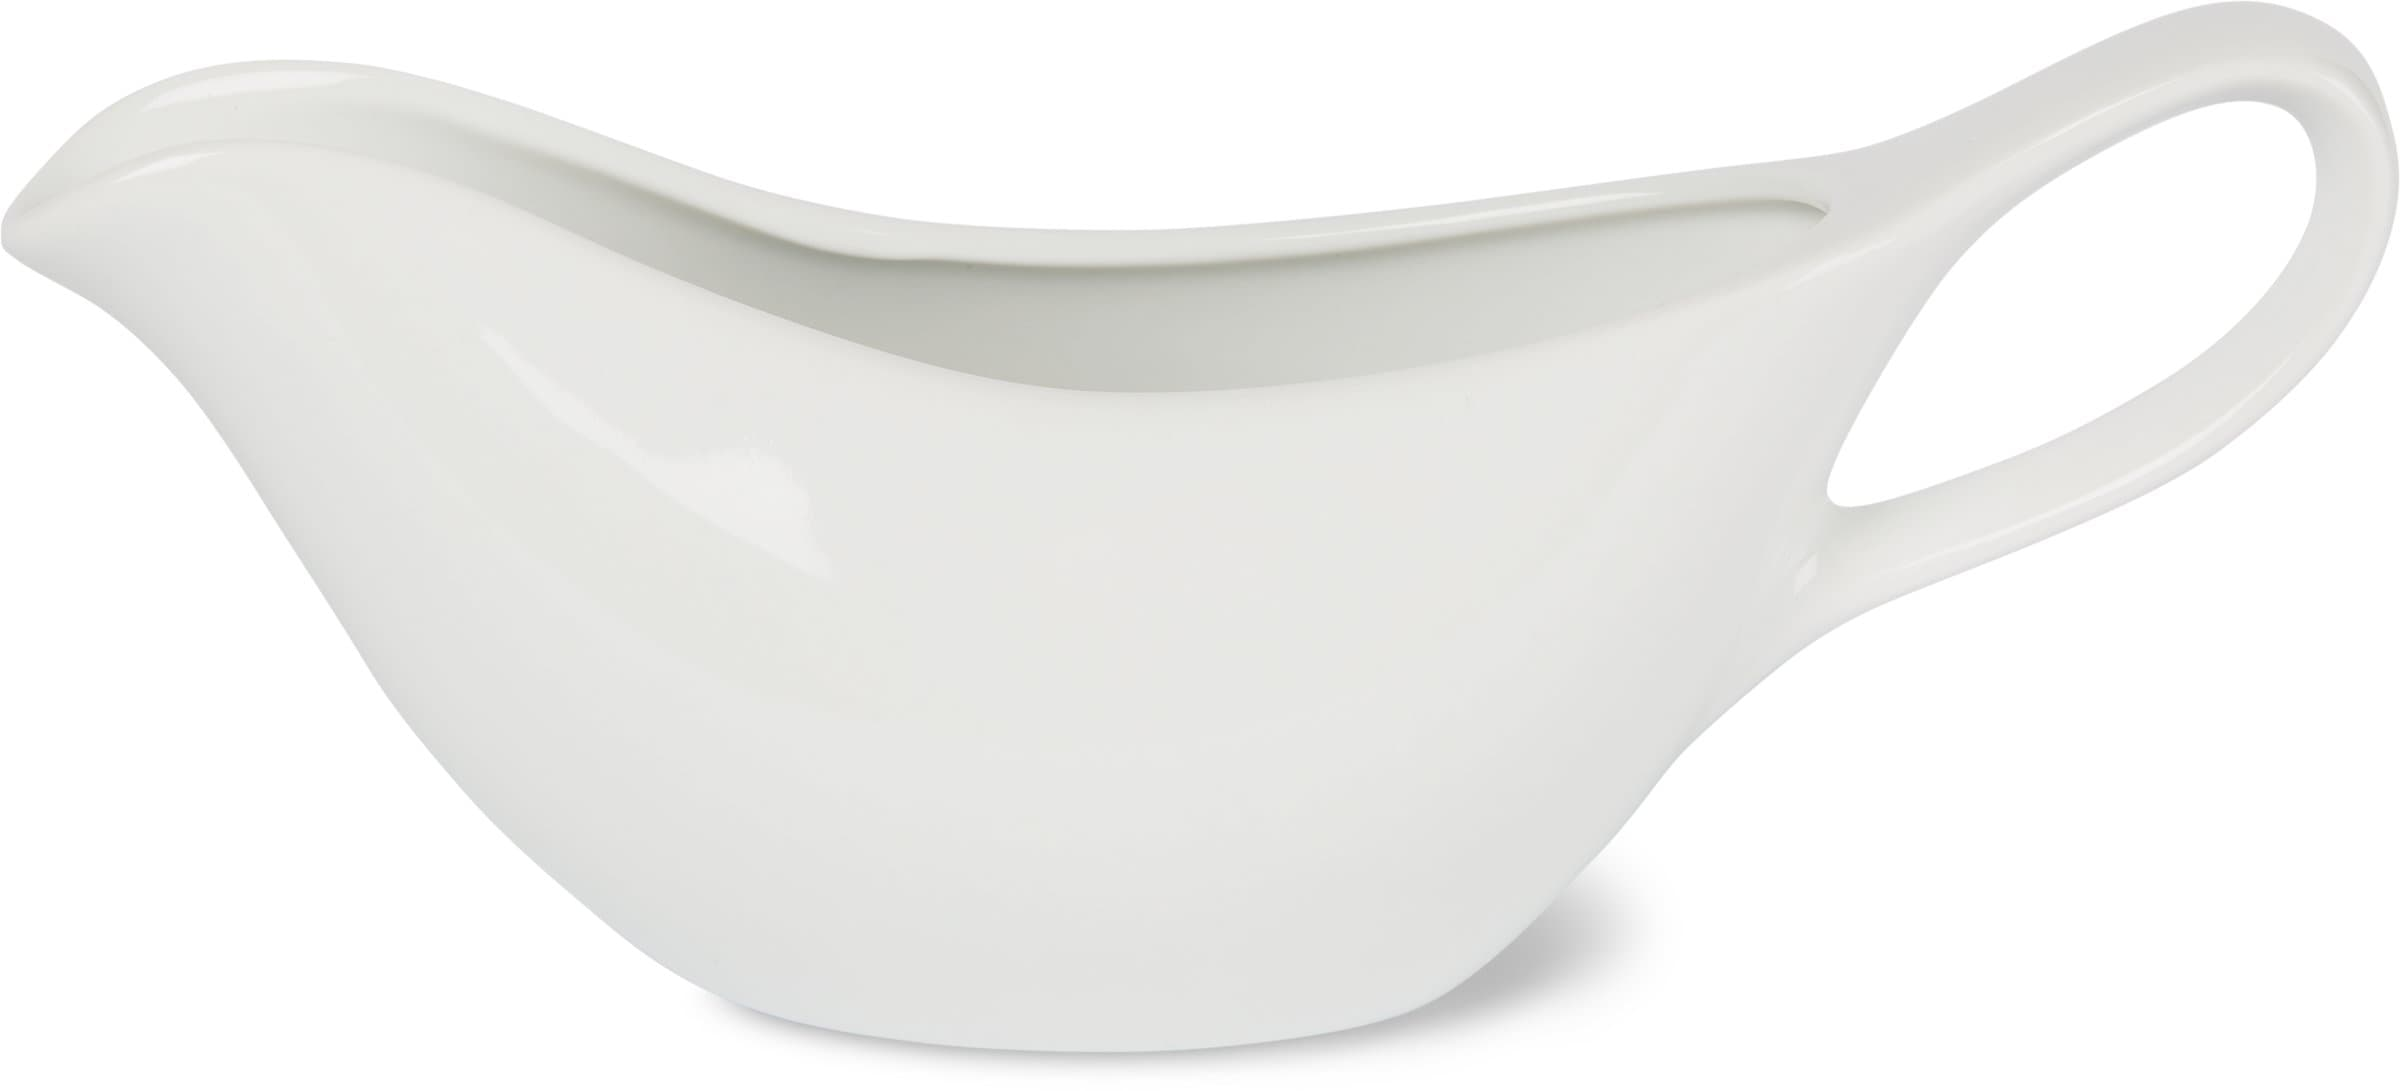 Cucina & Tavola Sauciere 260ml